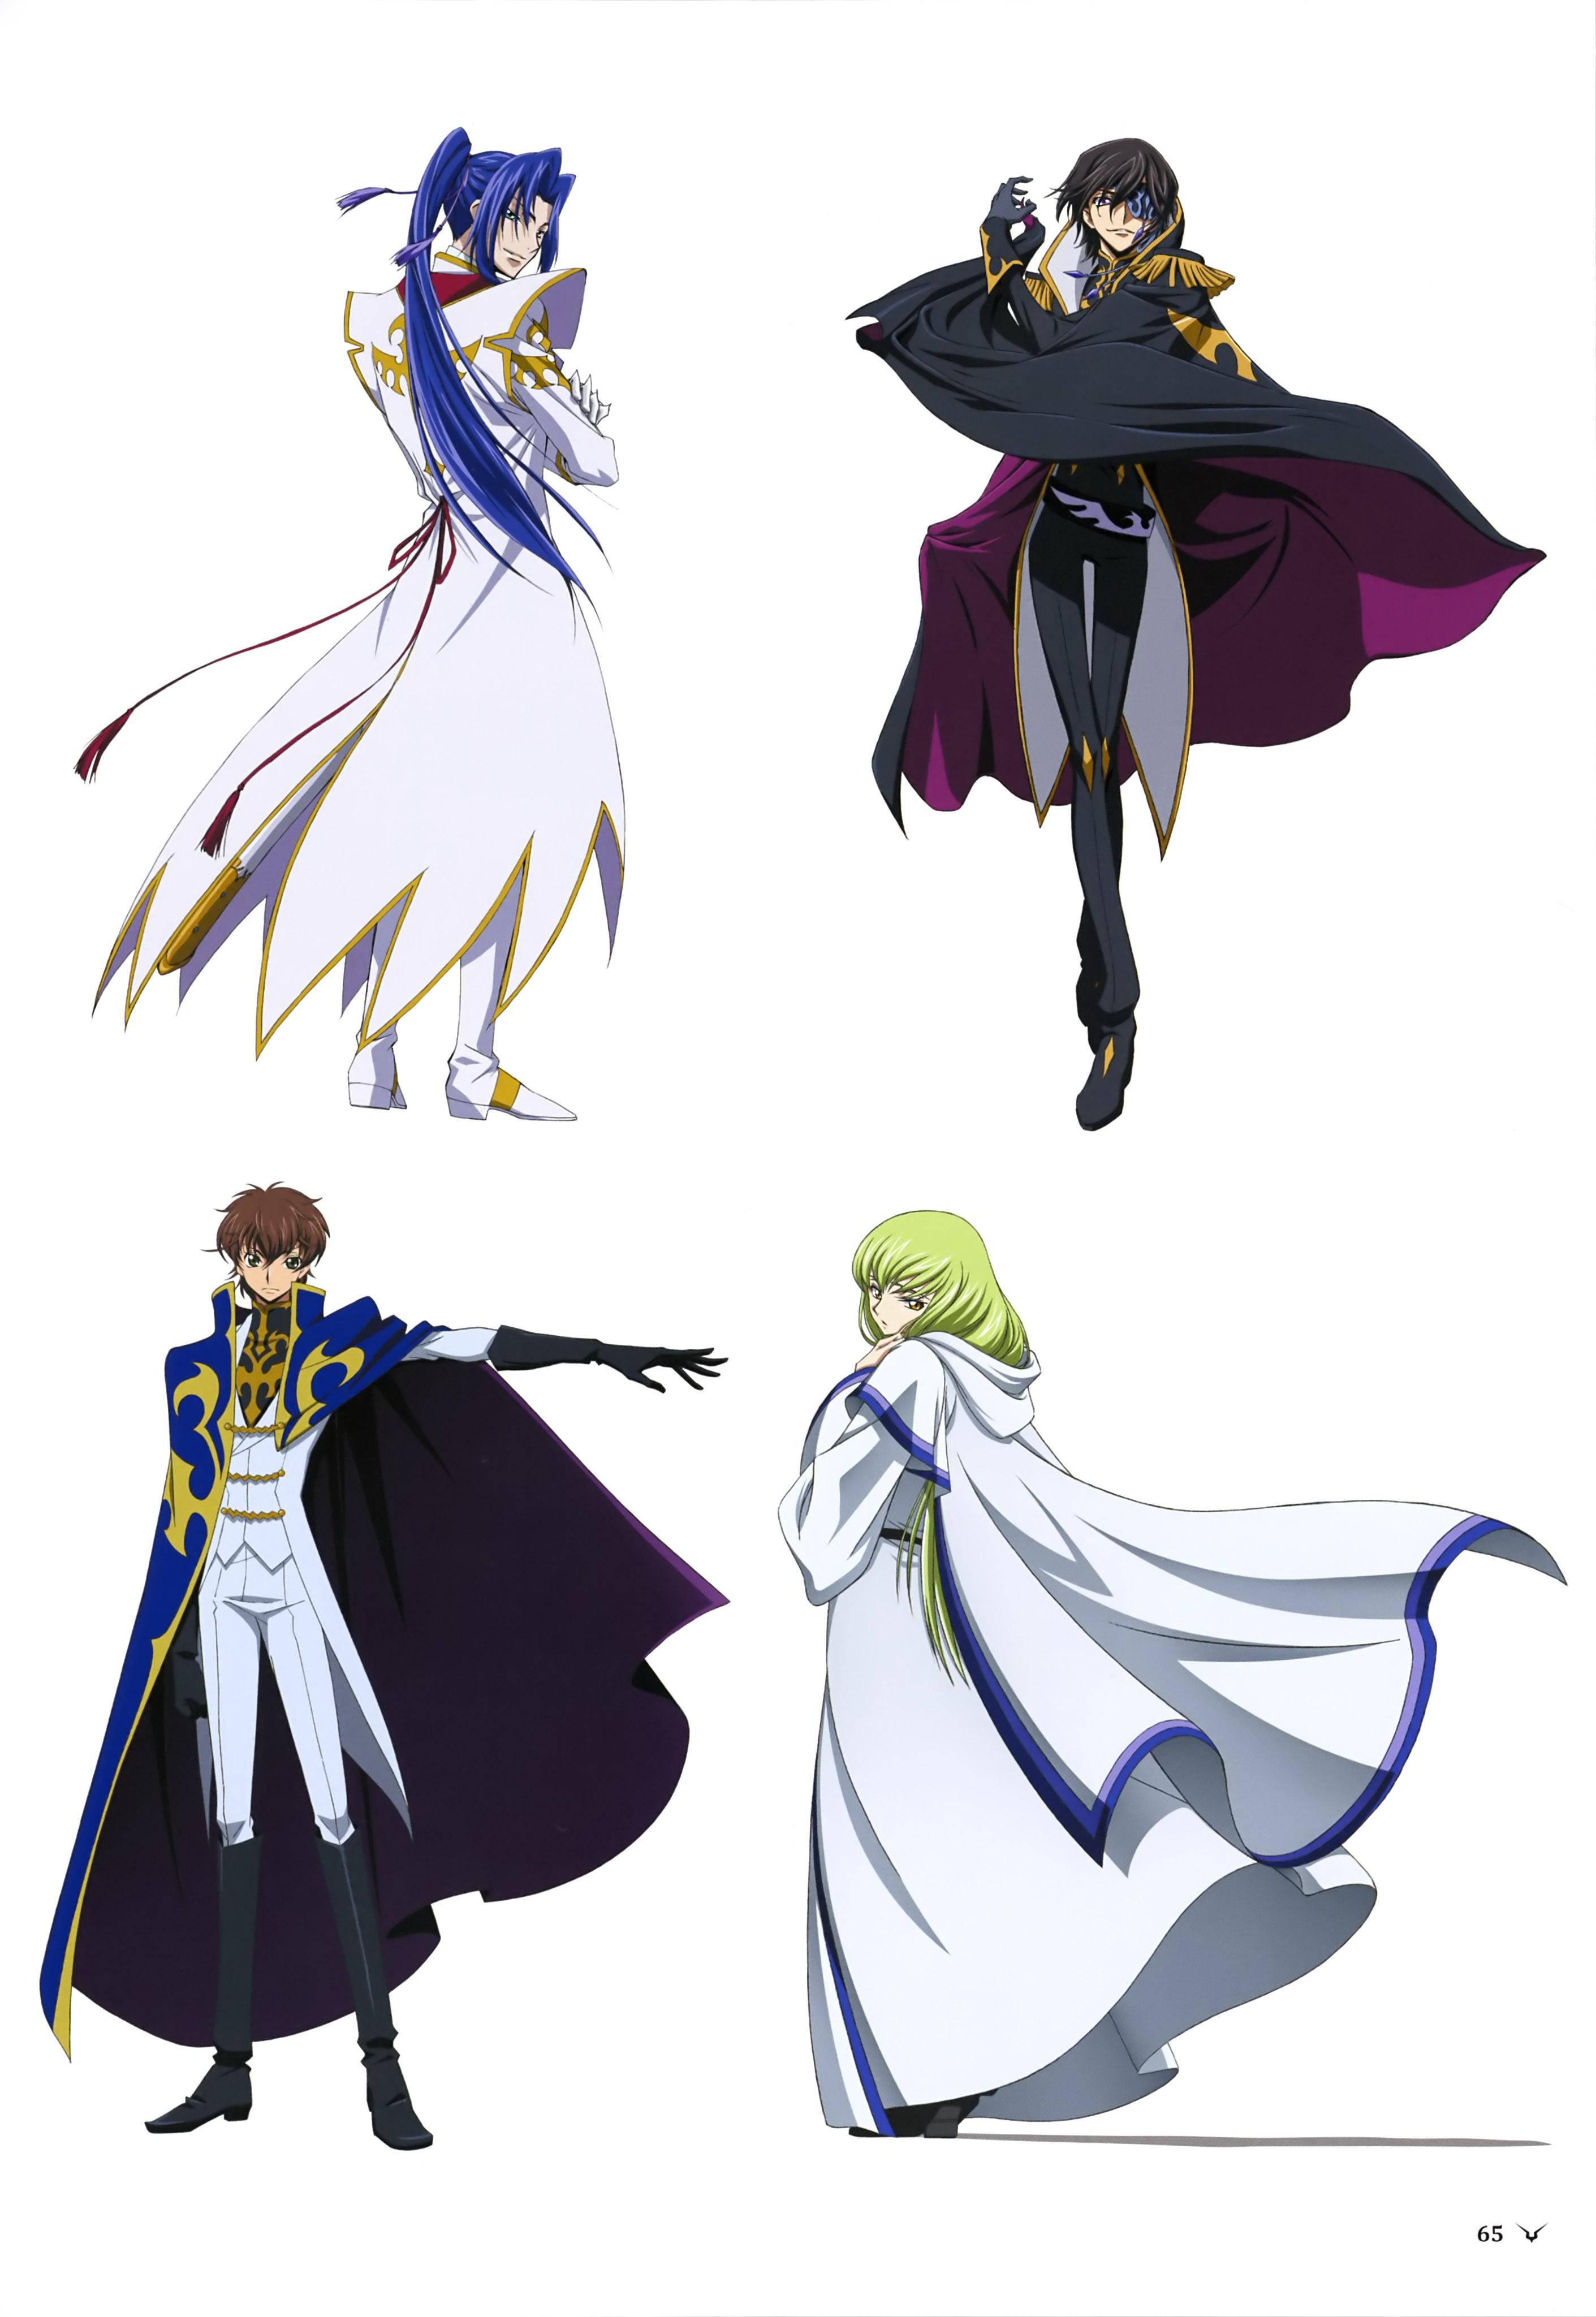 8cc6f02456ec63 Akito the Exiled (C.C., Suzaku Kururugi, Julius Kingsley, Shin Hyuuga  Shaingu)